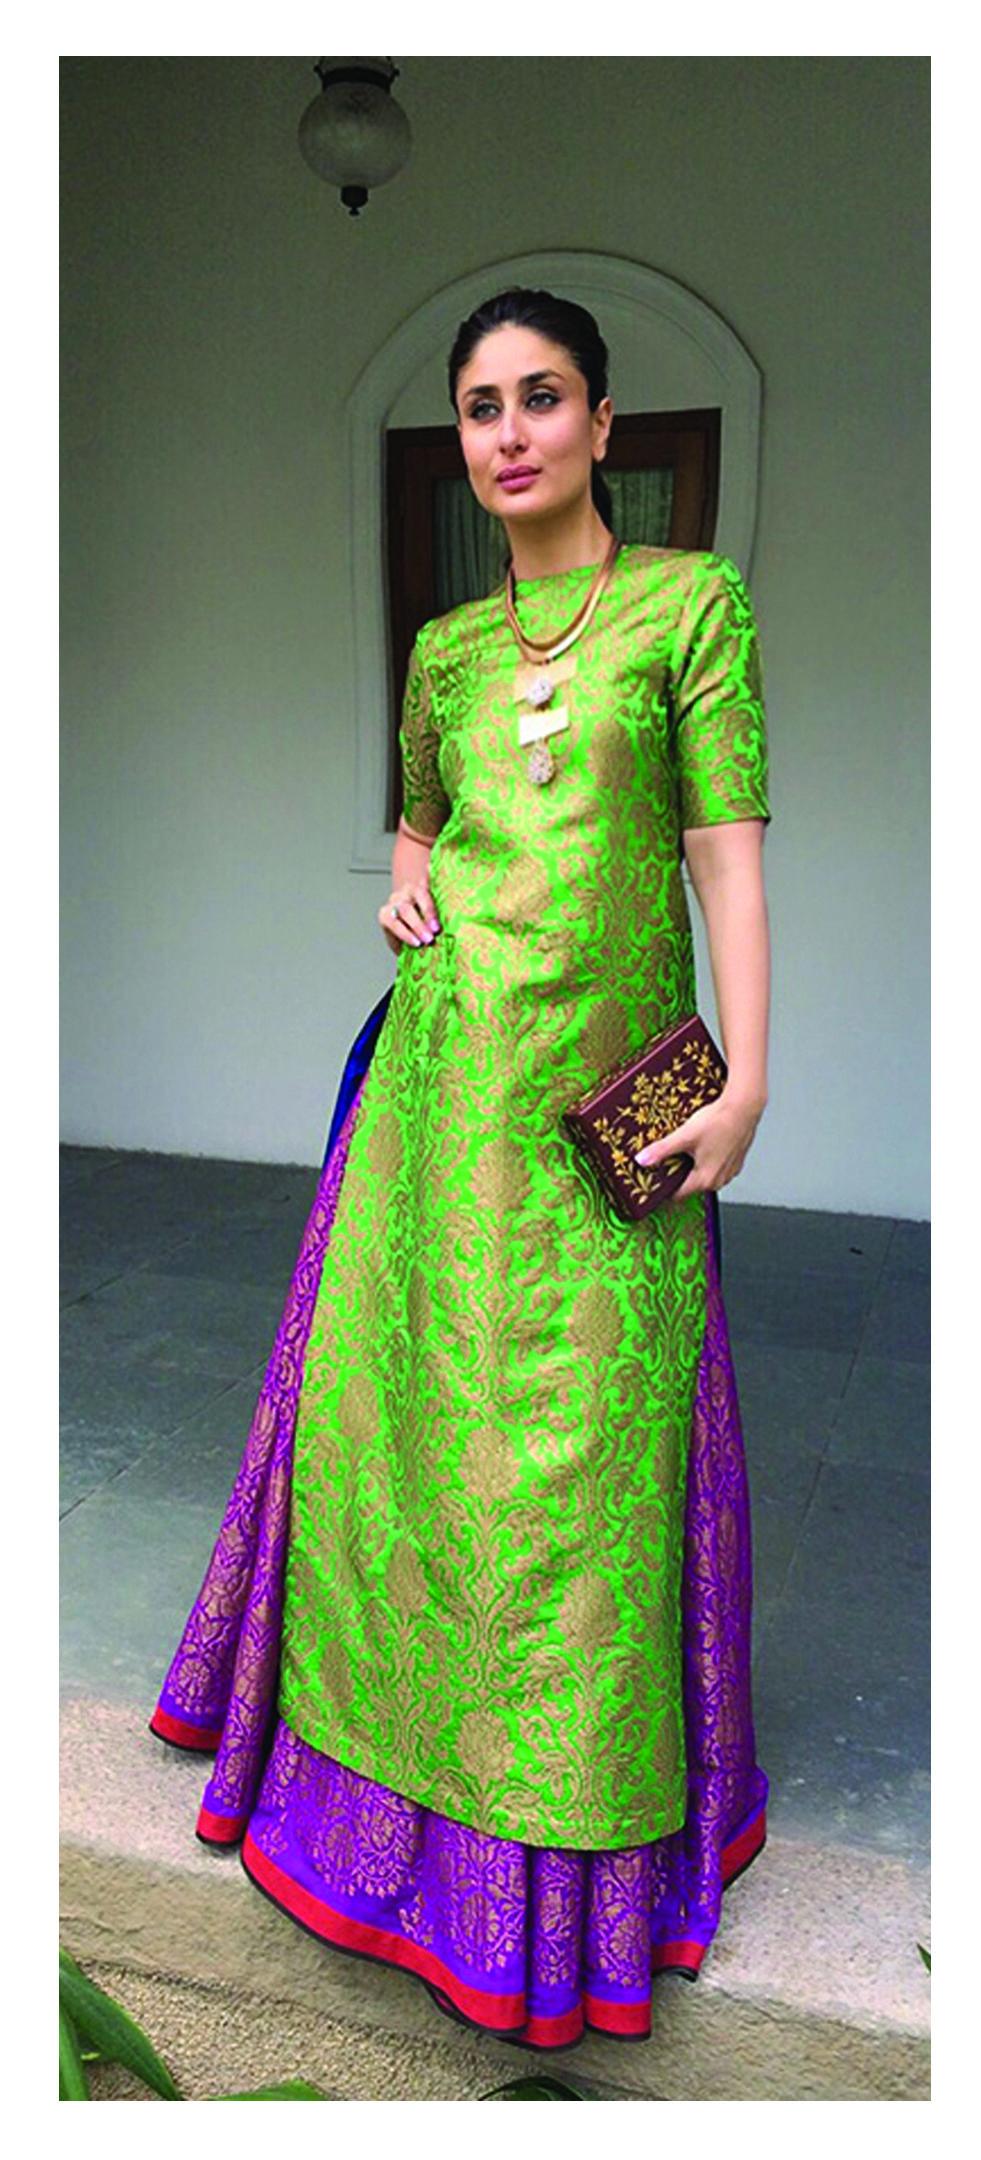 Kareena Kapoor Khan In Payalkhandwala Brocade Kurta And Brocade